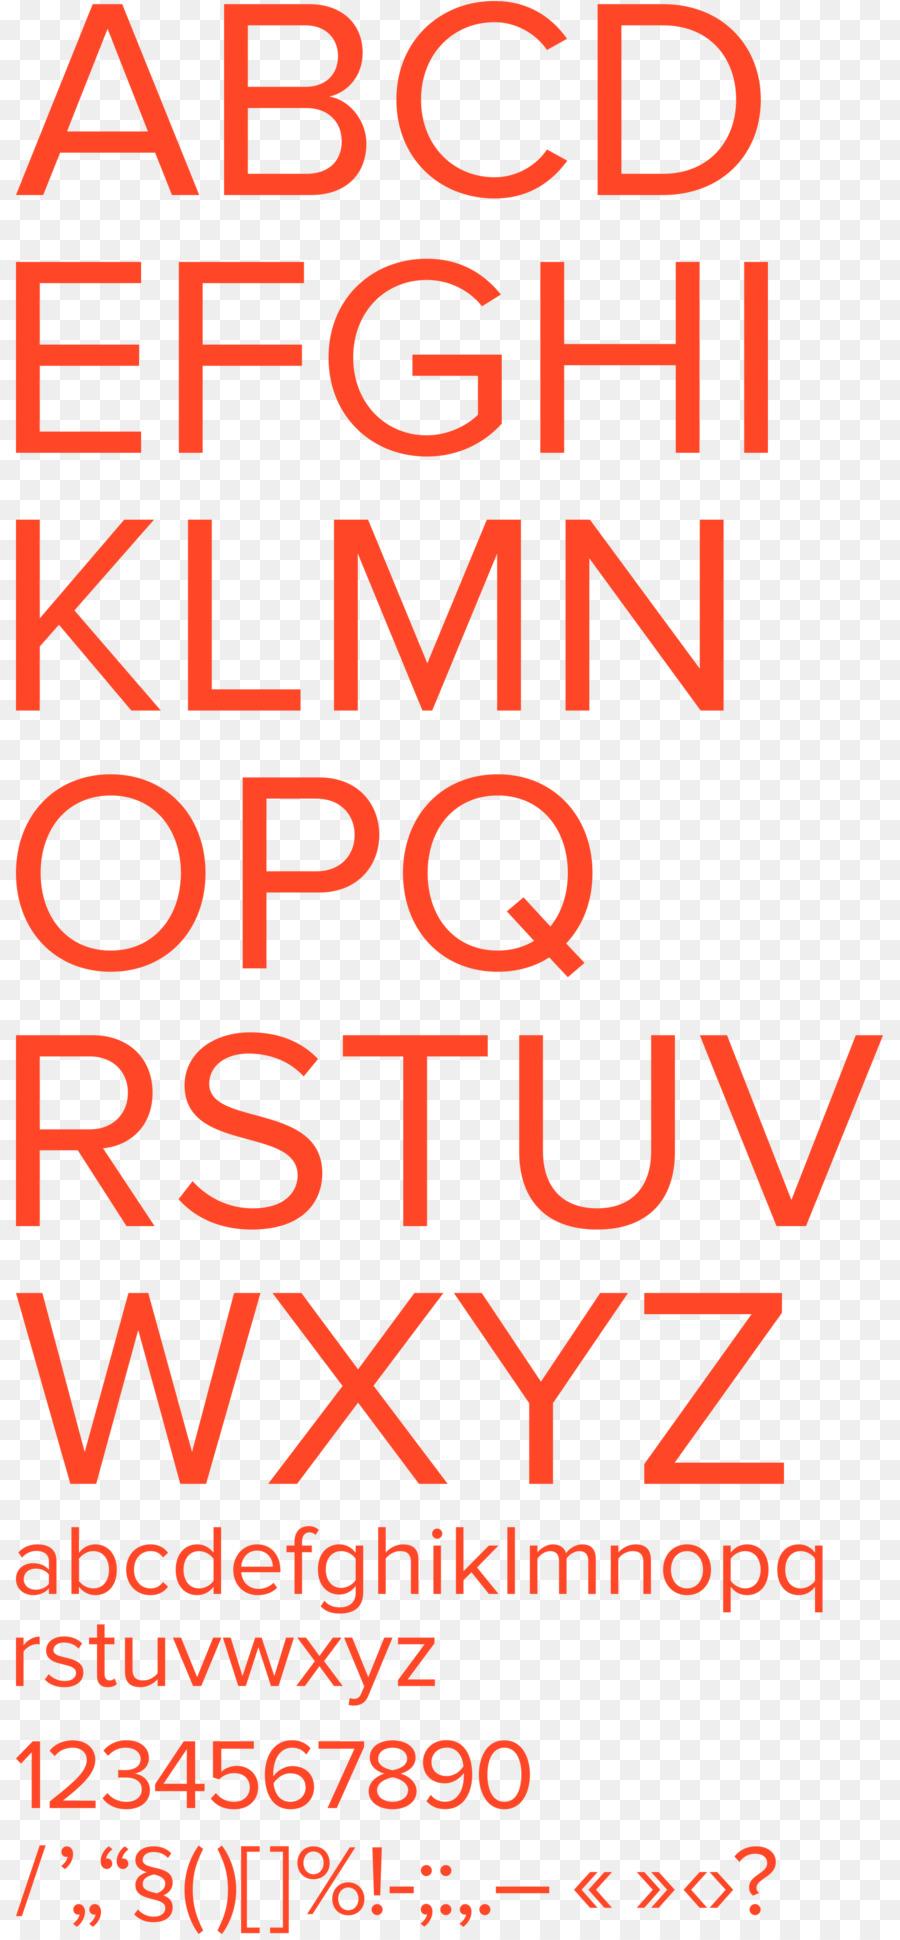 aphelbet jumbo lowercase r png download - 869*1935 - Free